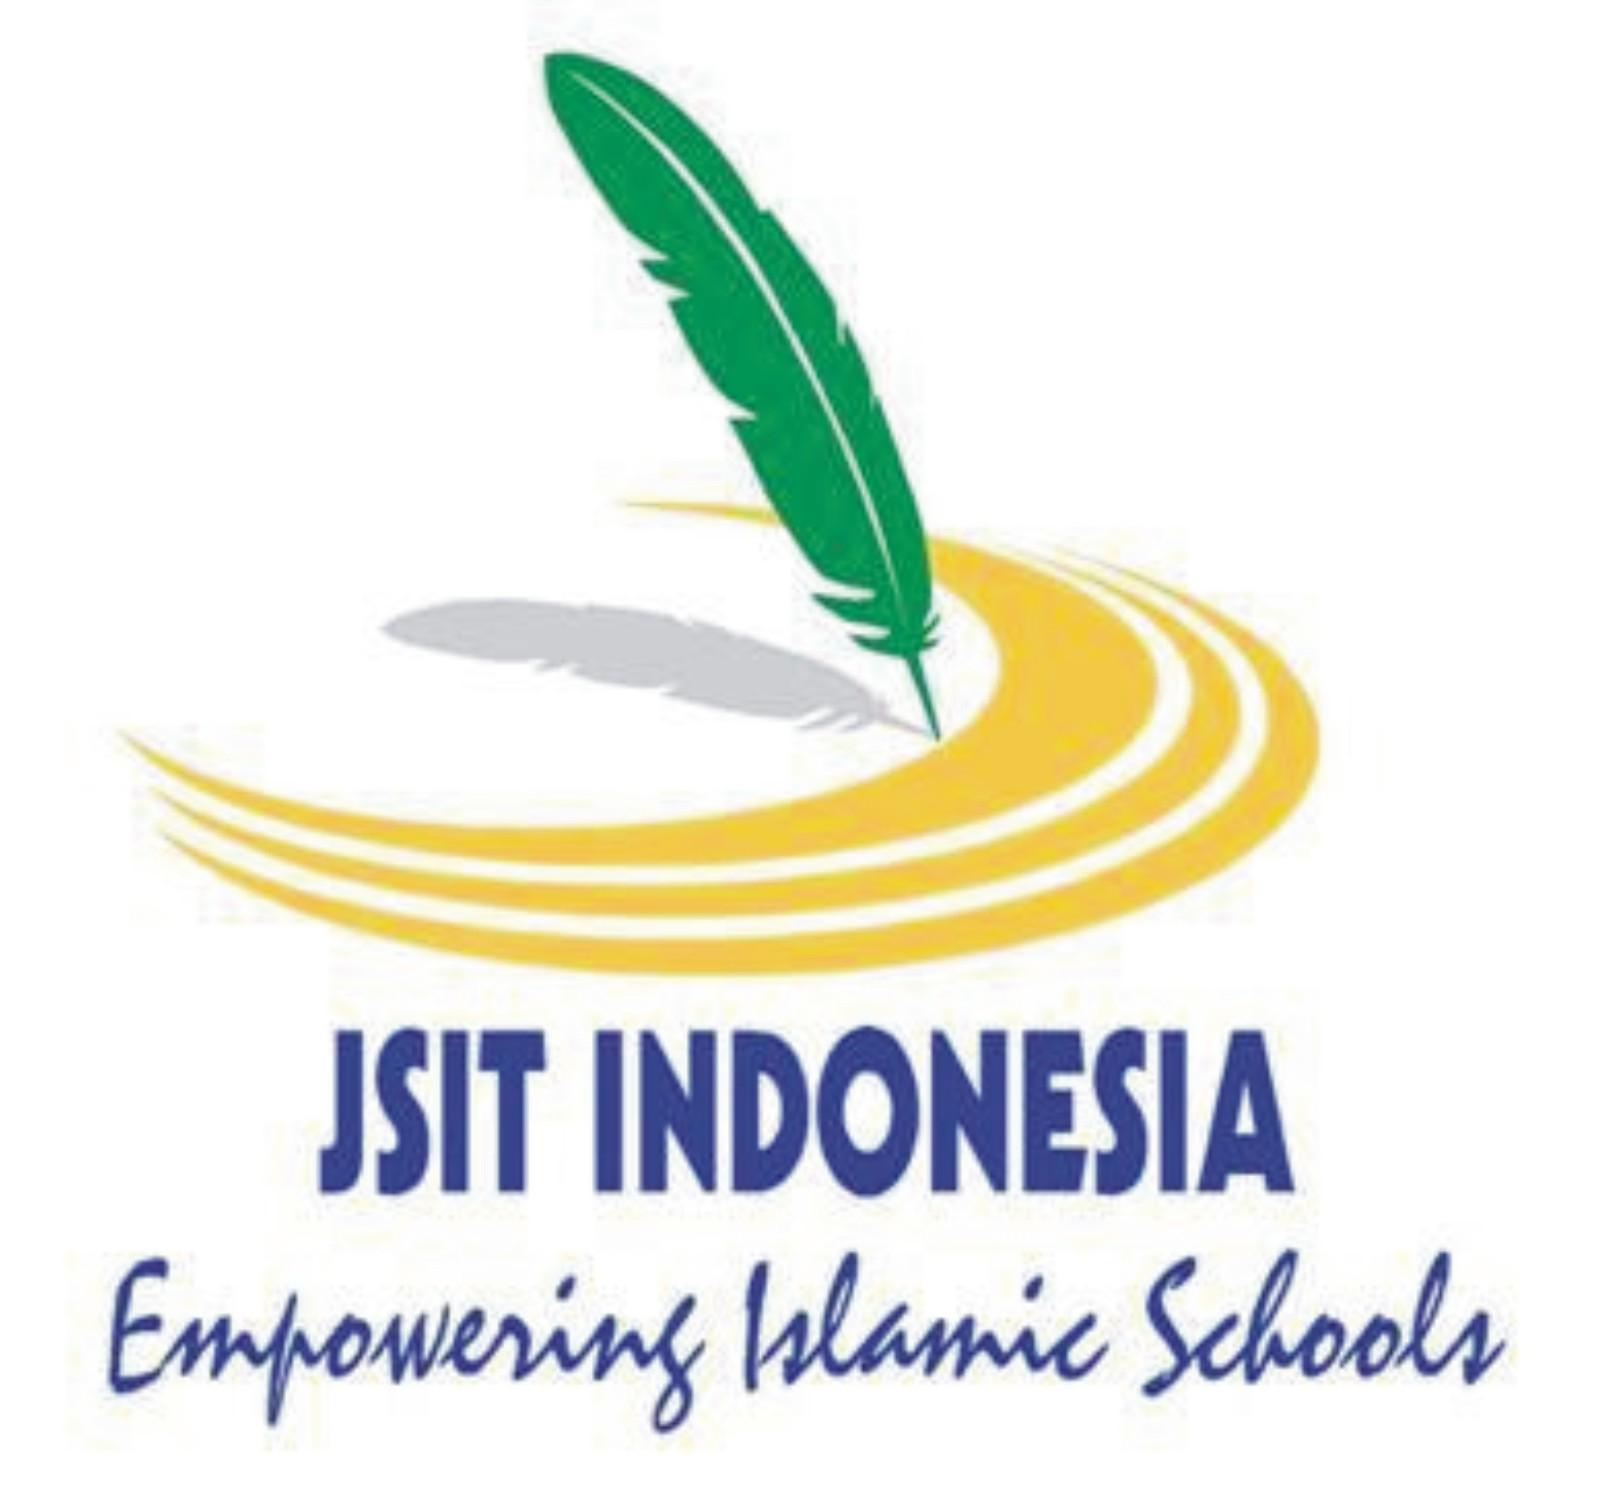 logo-jsit.jpg